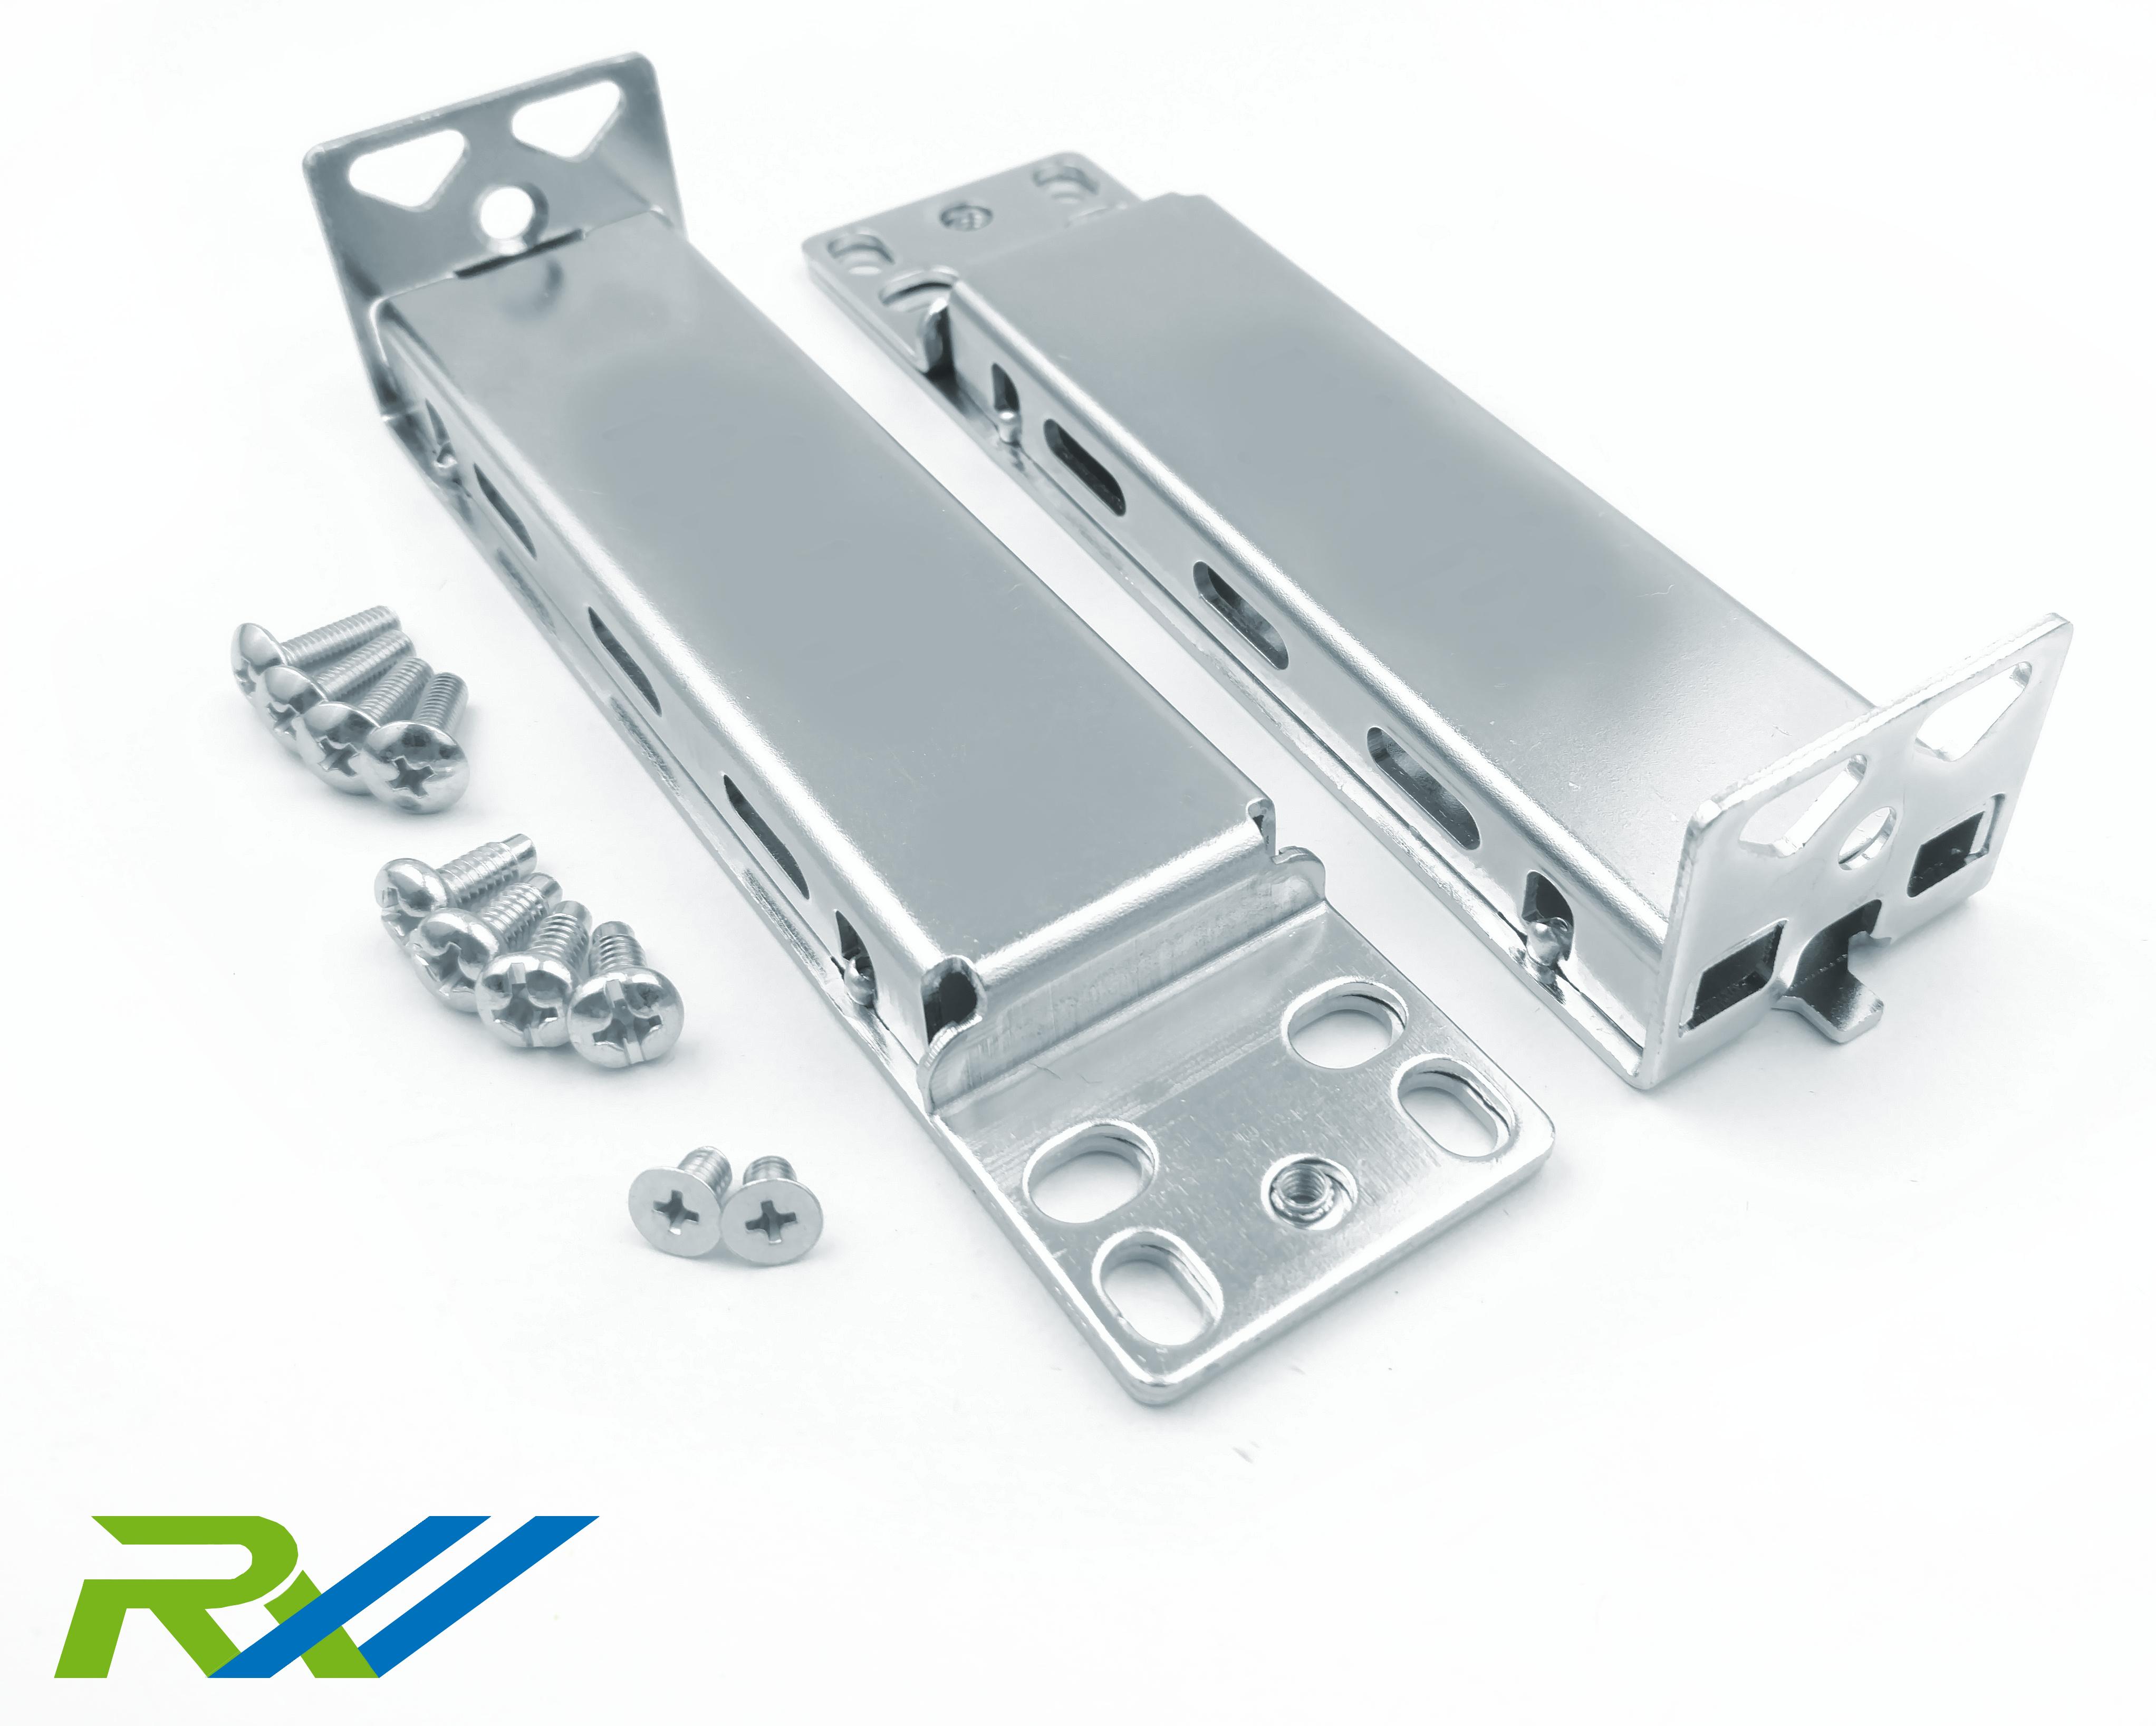 AP-702e  AIR-A AIR-AP-BRACKET-7= Cisco Universal Bracket for AP-702i